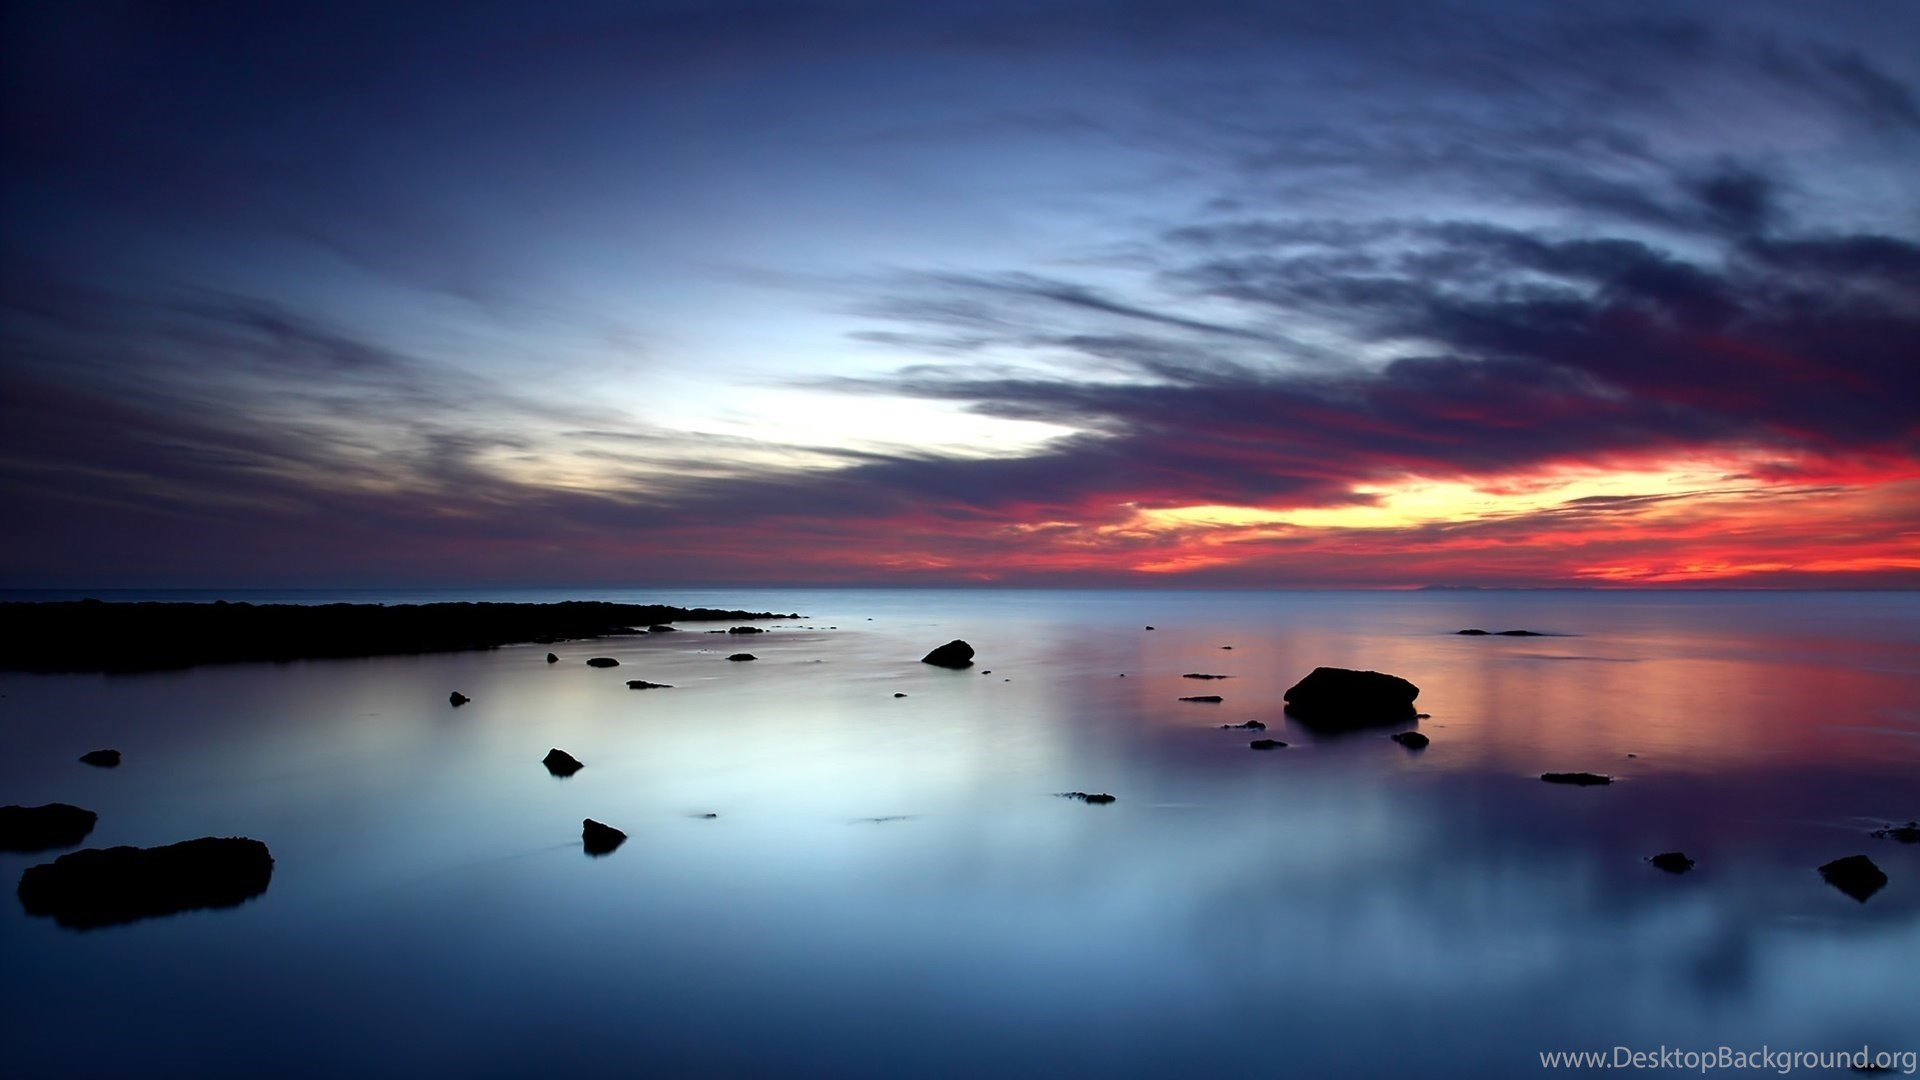 Ocean Sunset Wallpapers HD Desktop Background